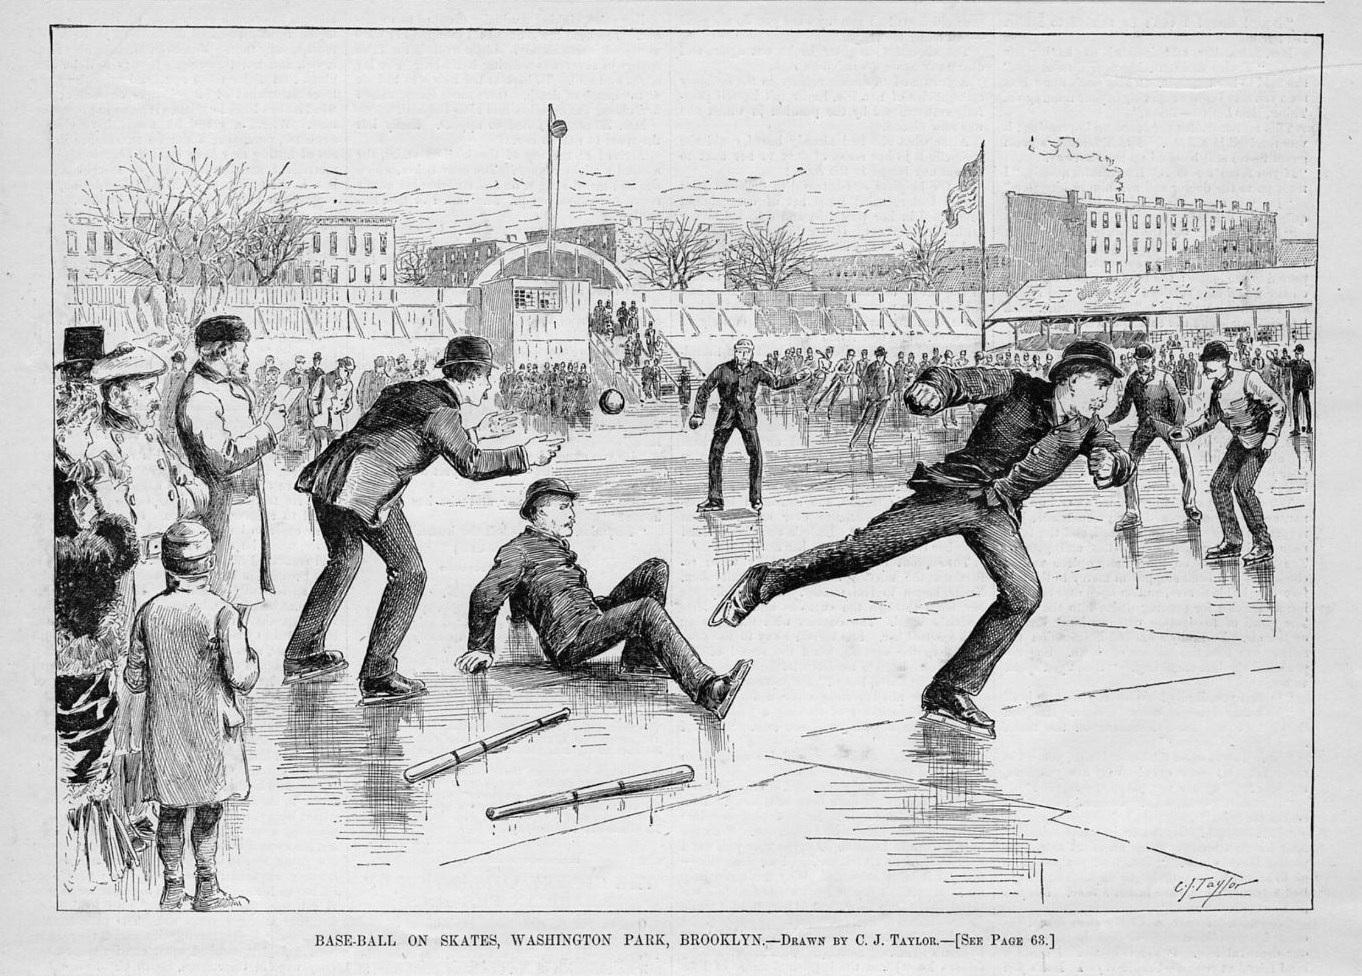 BASE-BALL ON SKATES WASHINGTON PARK BROOKLYN SPORTS SPECTATORS 1884 BASEBALL